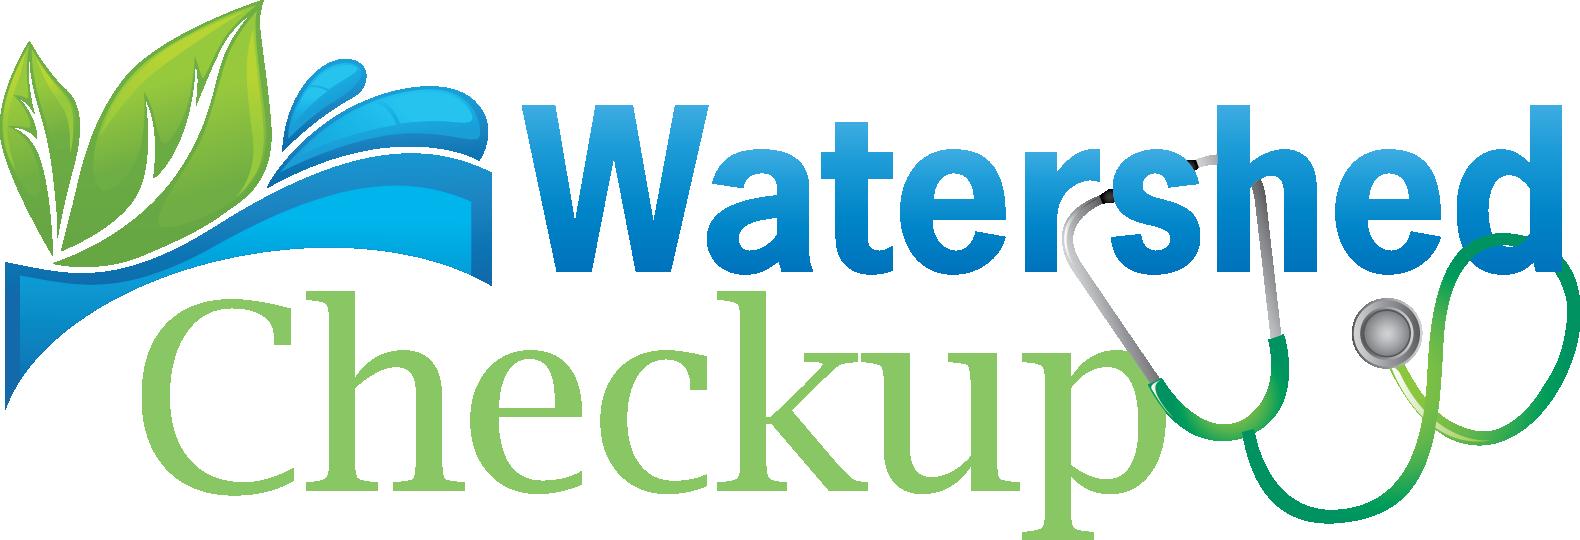 Watershed Checkup logo